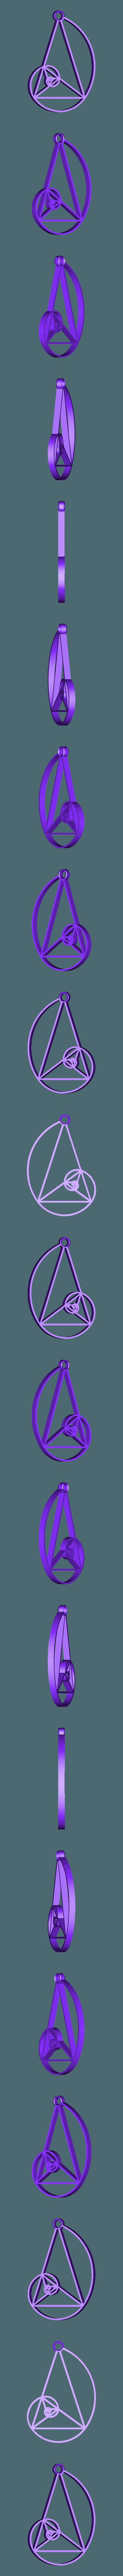 LogaSpiral70mm.stl Download free STL file Logarithmic Spiral, Golden Triangle, Golden Gnomon, Spira Mirabilis • 3D print object, LGBU